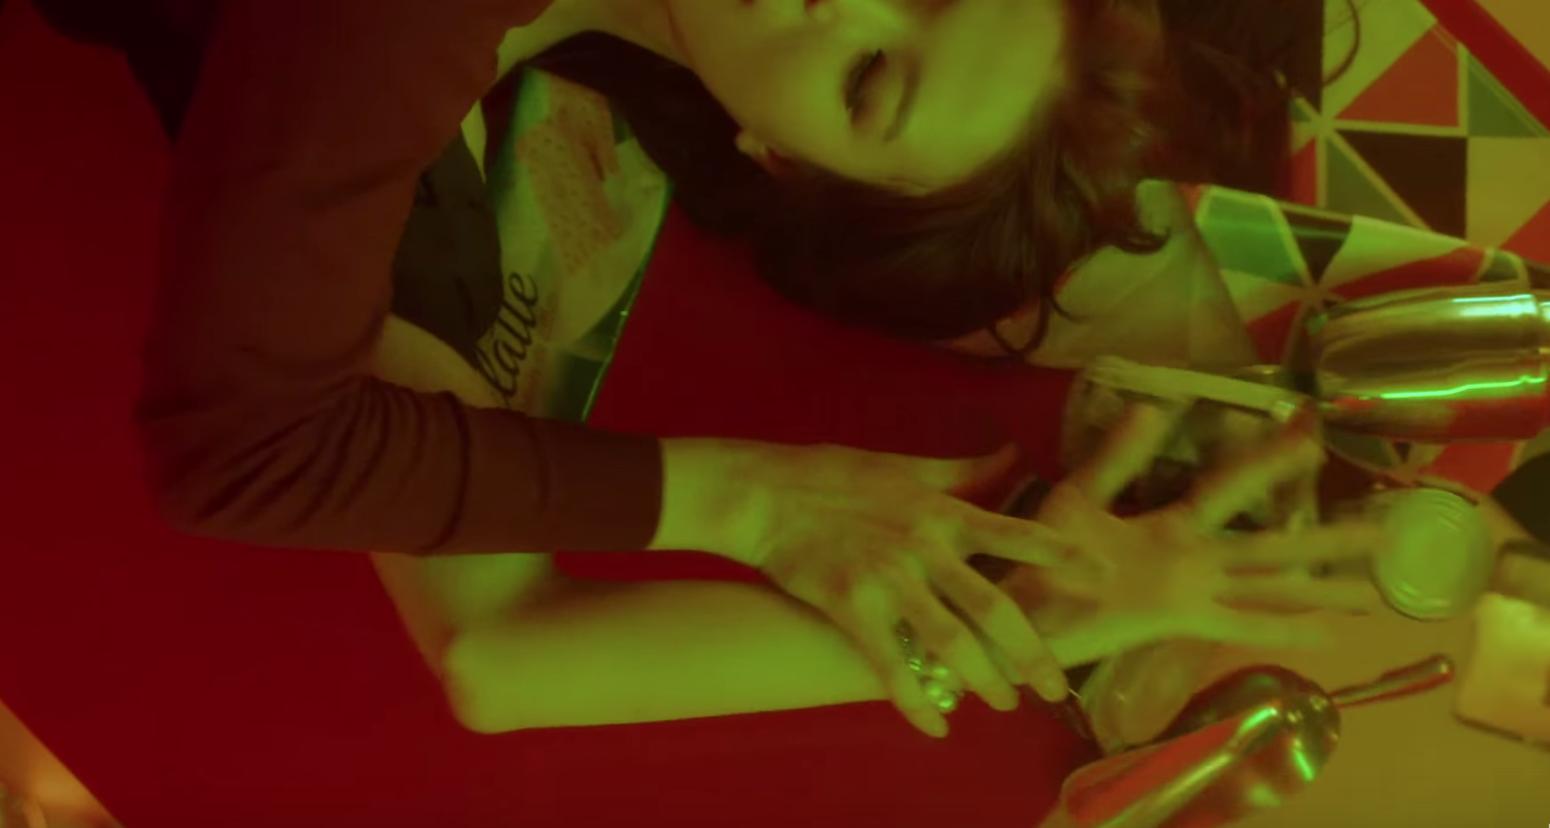 gary joa jay park music video teaser